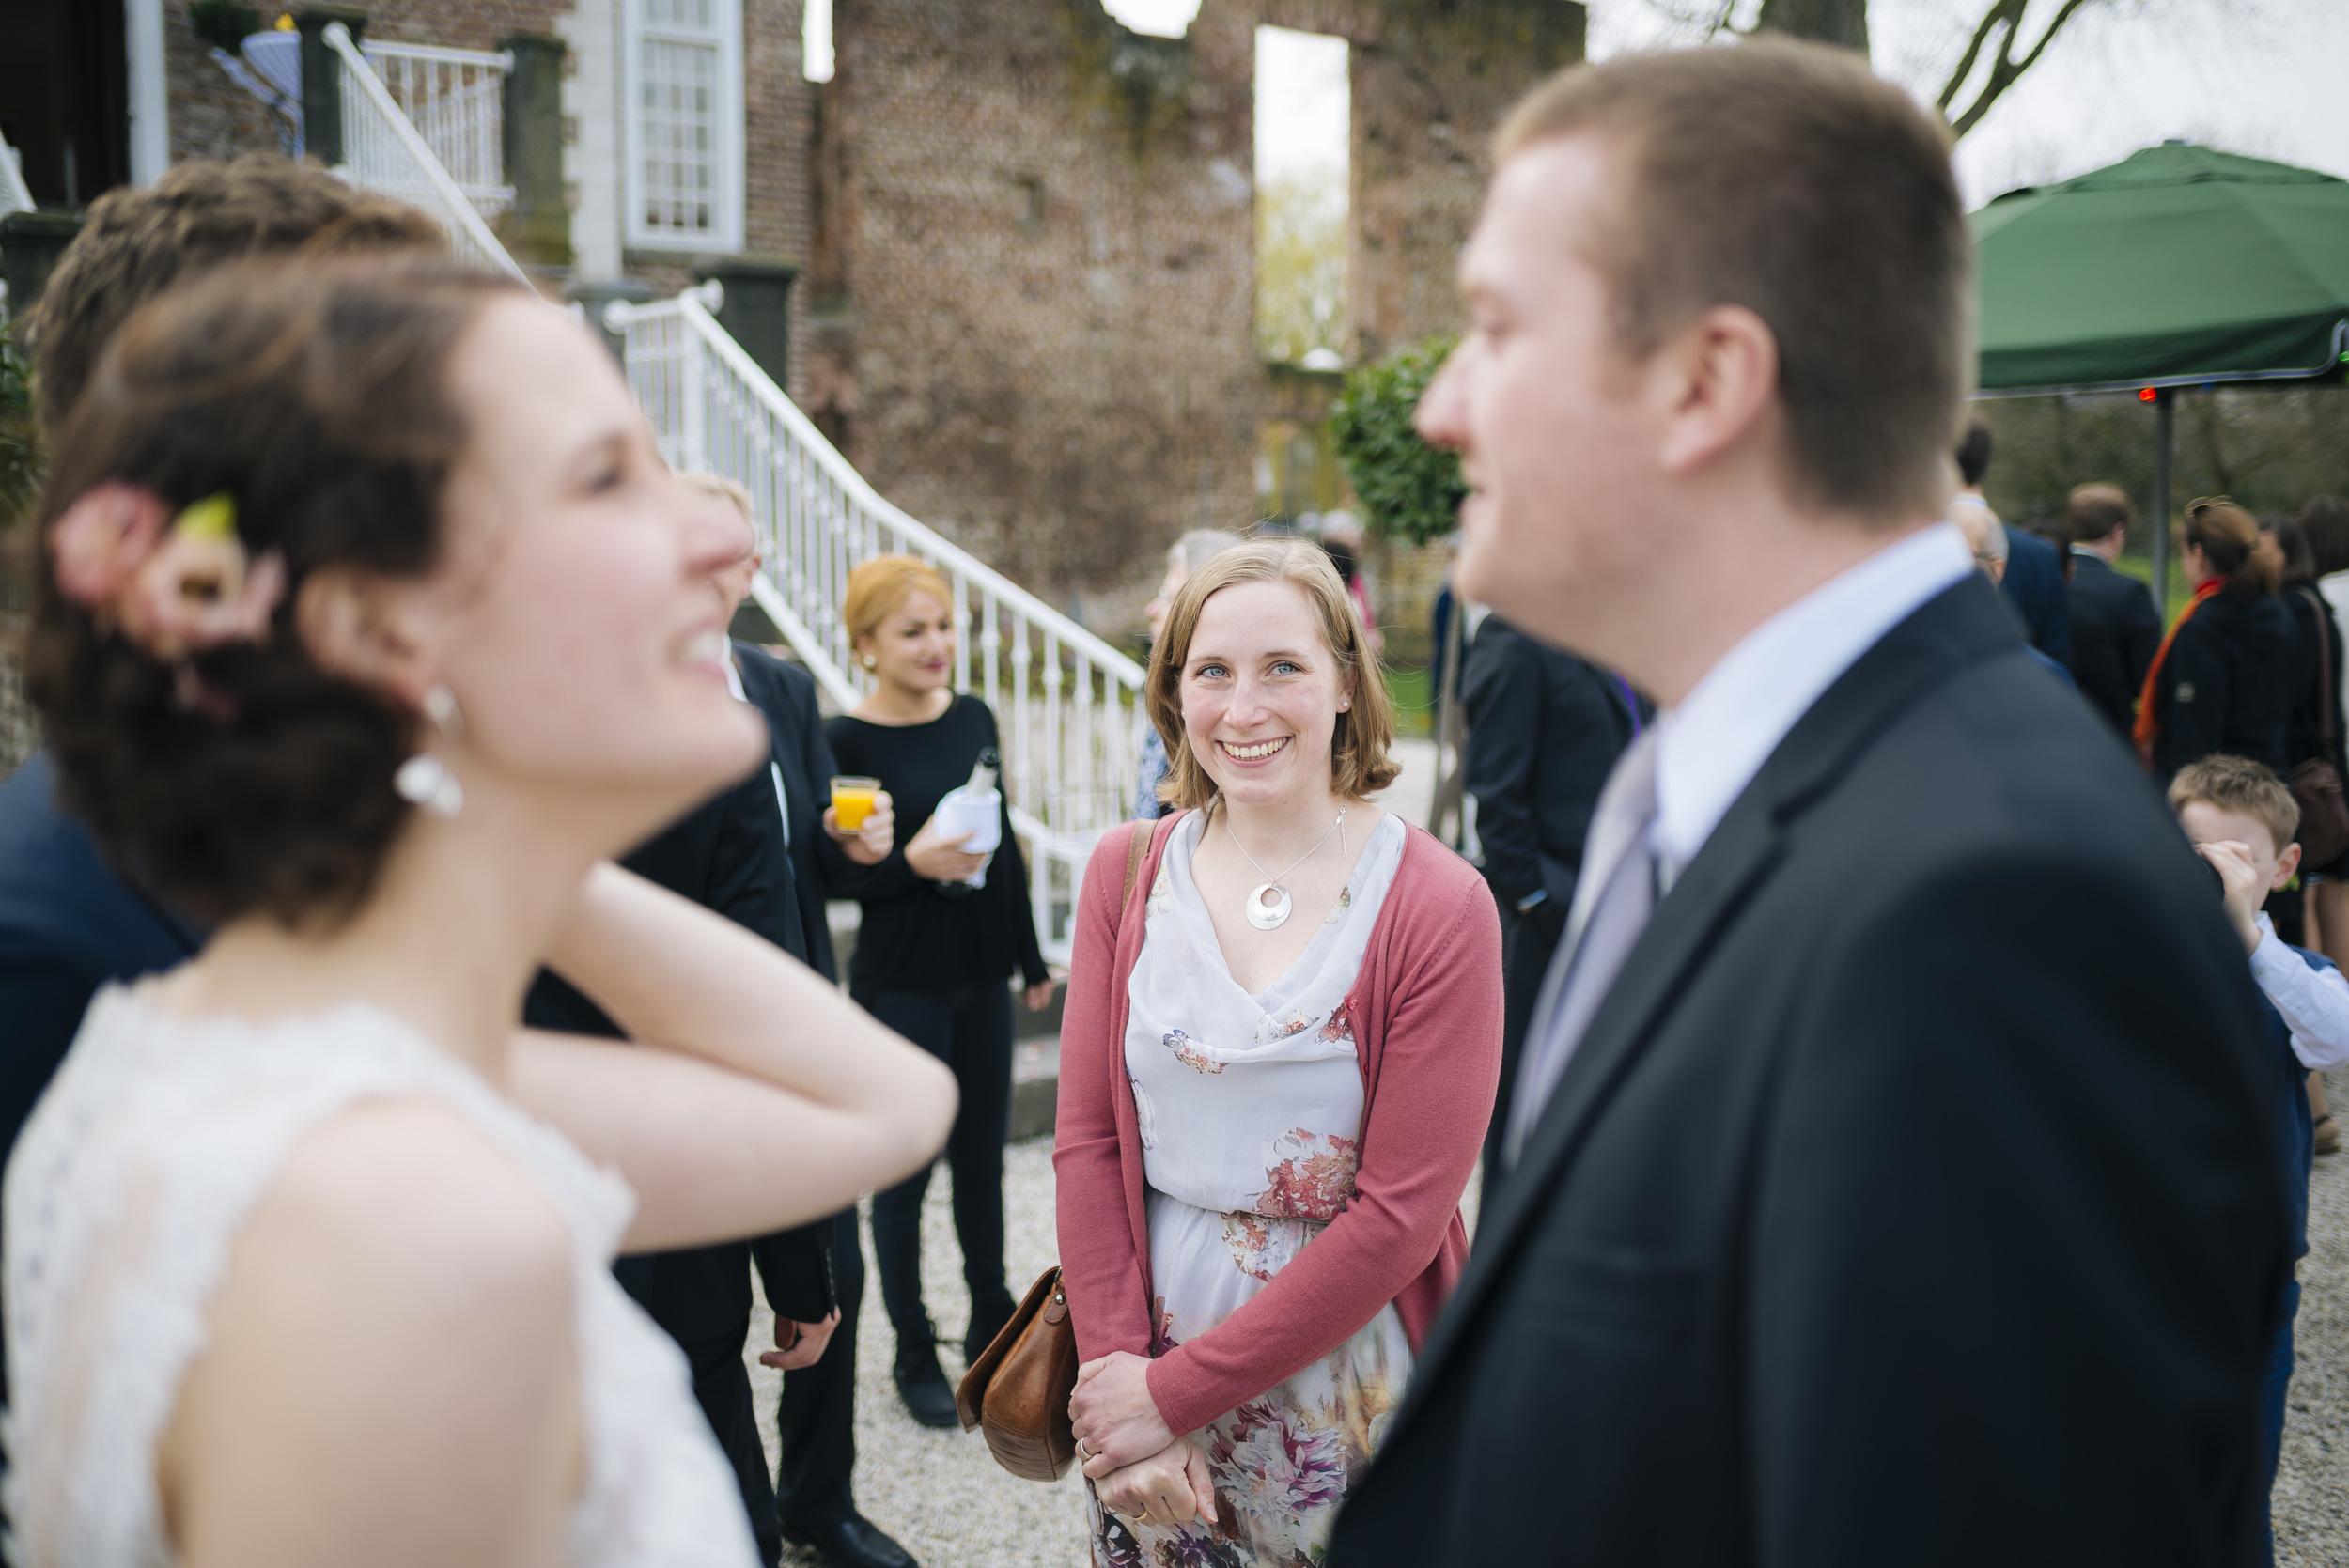 Hochzeitsfotograf-Schlossruine-Hertefeld-Weeze-096.jpg